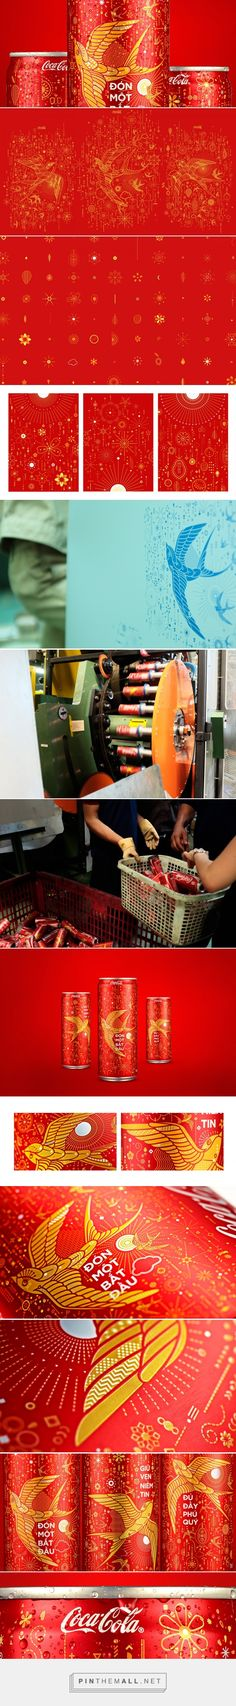 Coca-Cola Chinese New Year packaging design by Ki Saigon - http://www.packagingoftheworld.com/2016/11/coca-cola-tet-2017.html - created via https://pinthemall.net